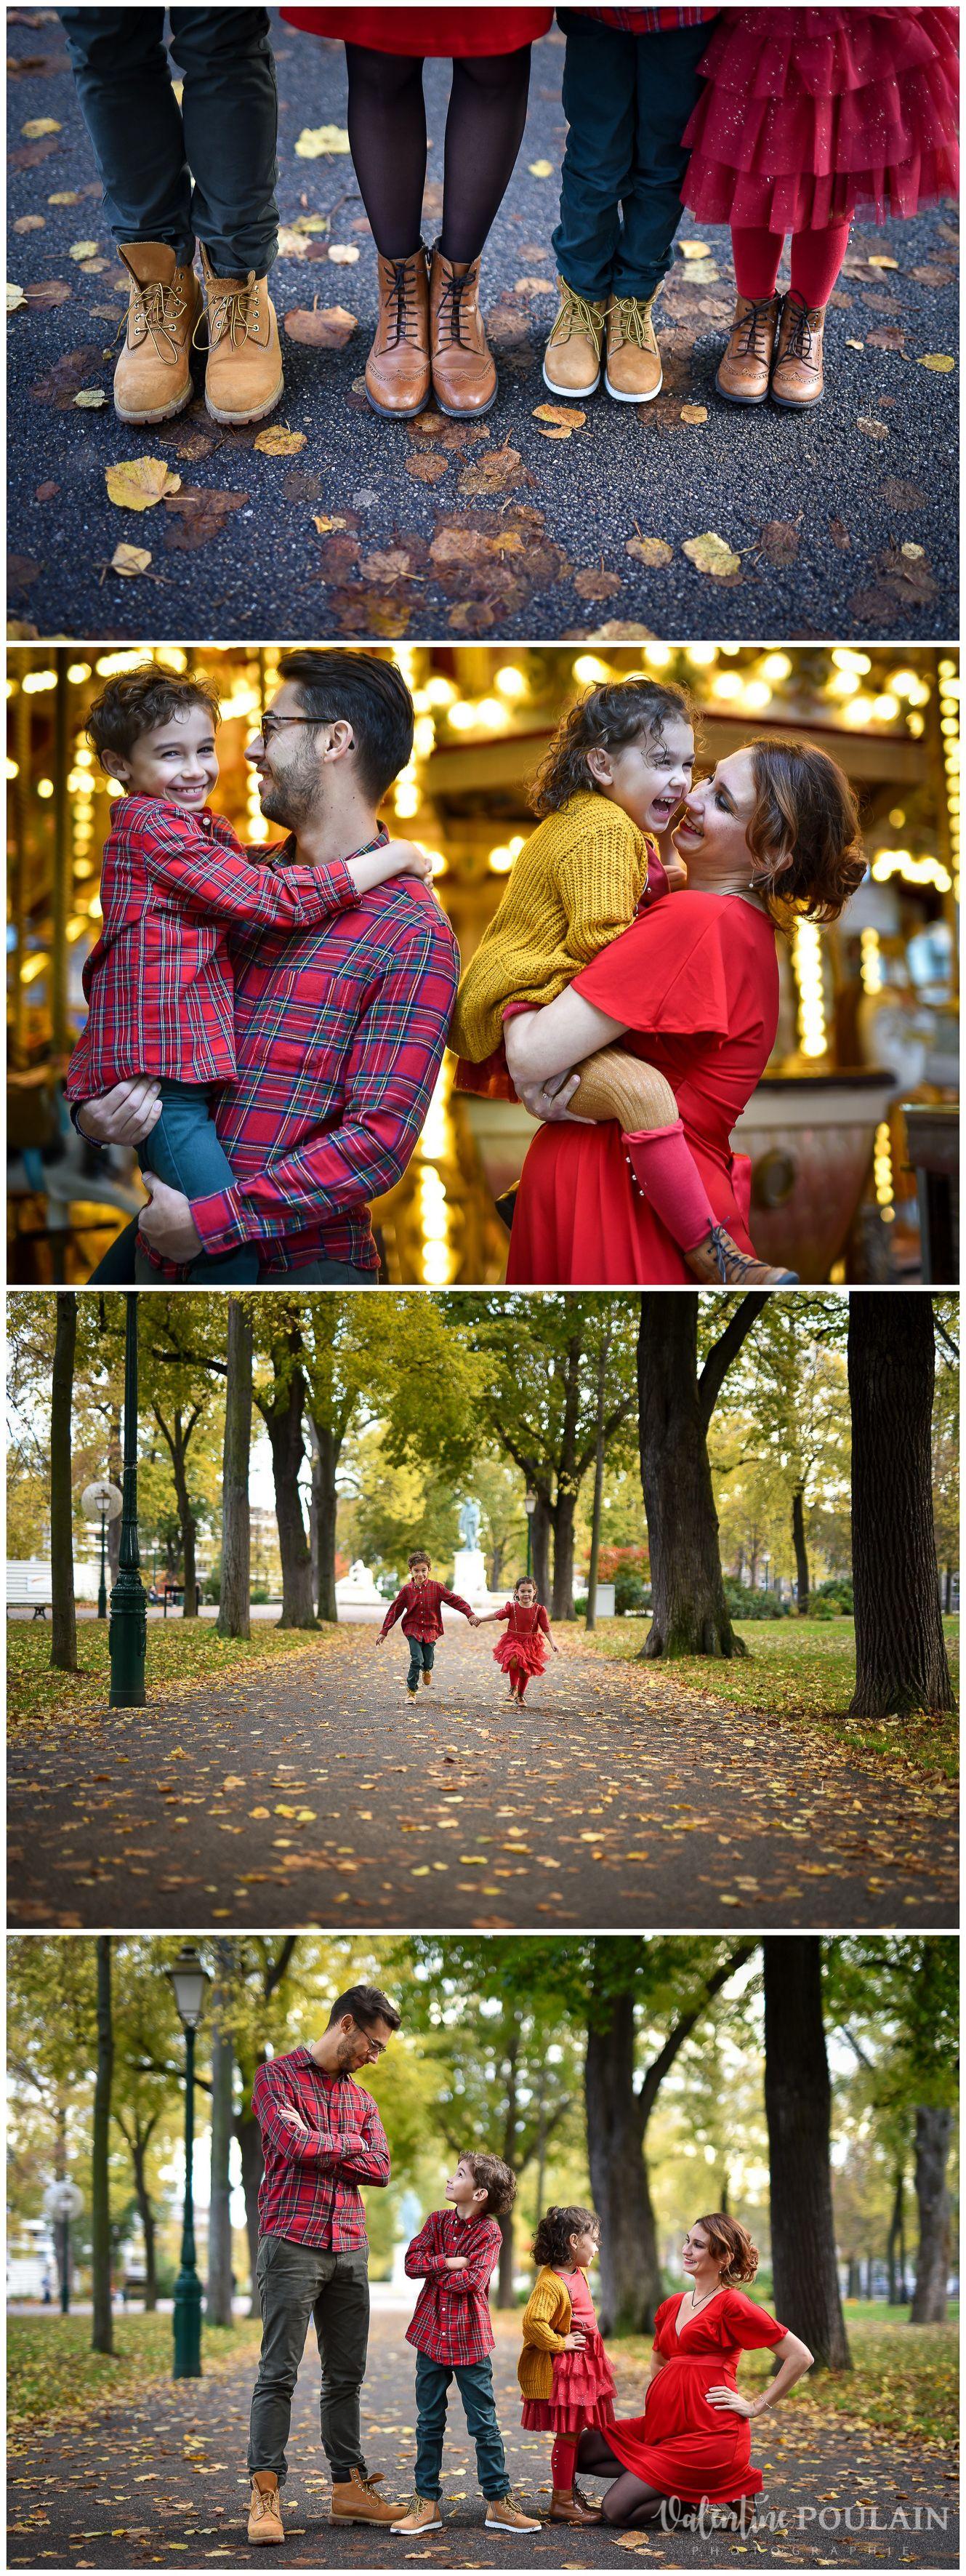 Shooting Photo Maternite Colmar Alsace Valentine Poulain Shooting Photo Famille Photo Maternite Photoshoot De Famille